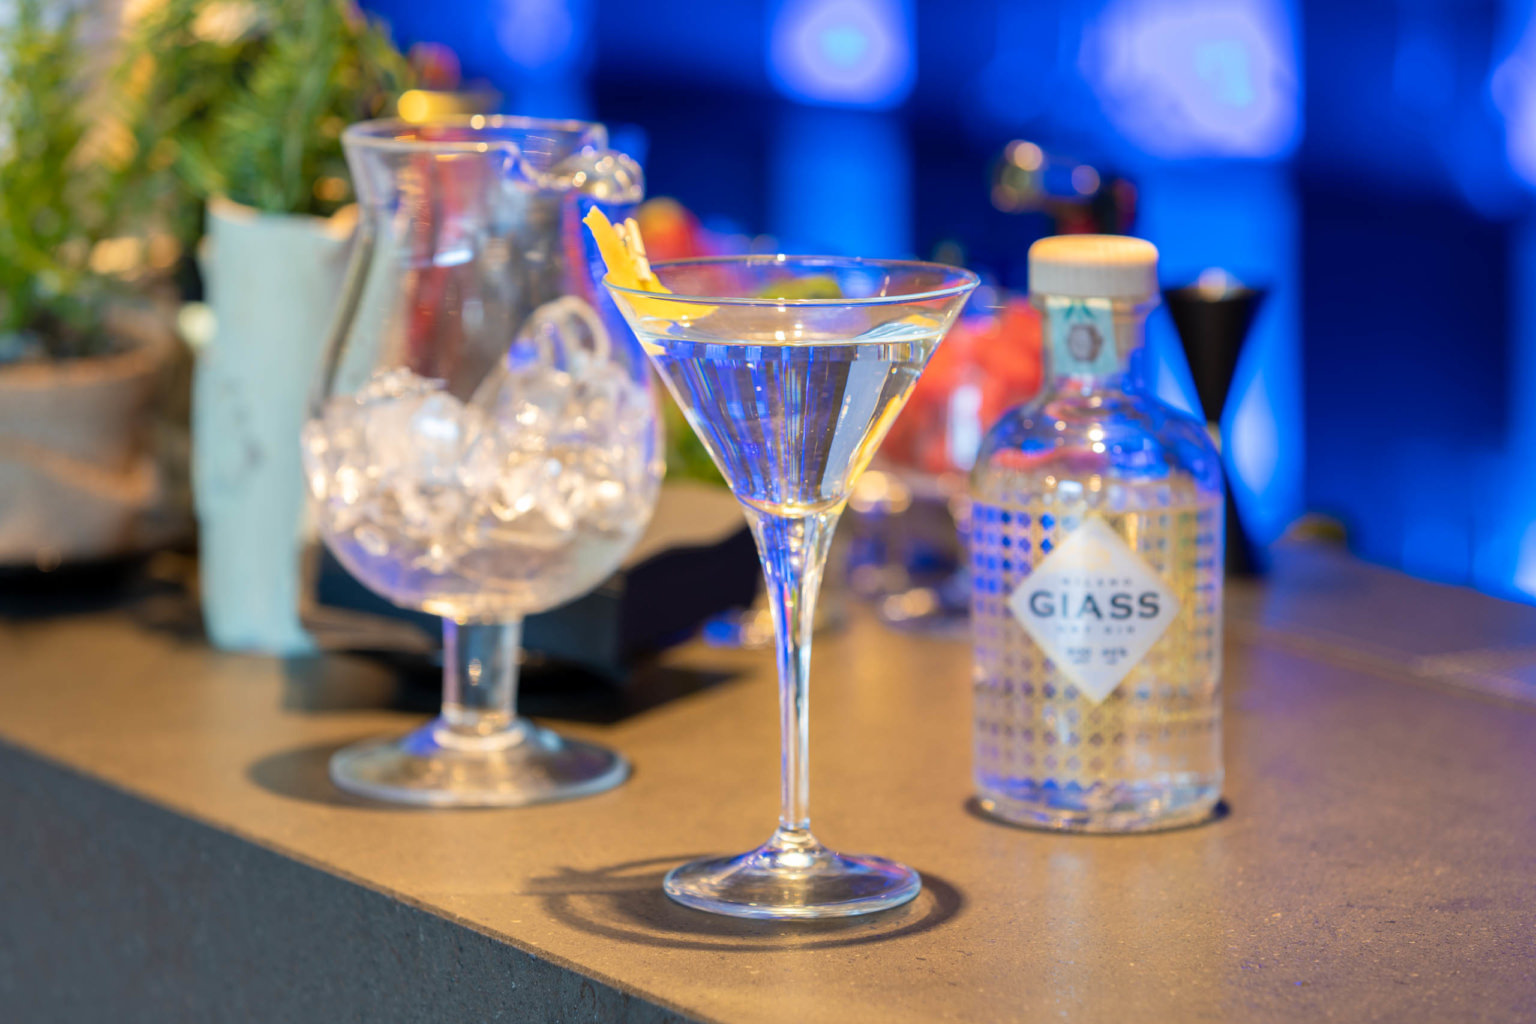 Fotografo Food Venezia Mestre Cocktail Dry Gin